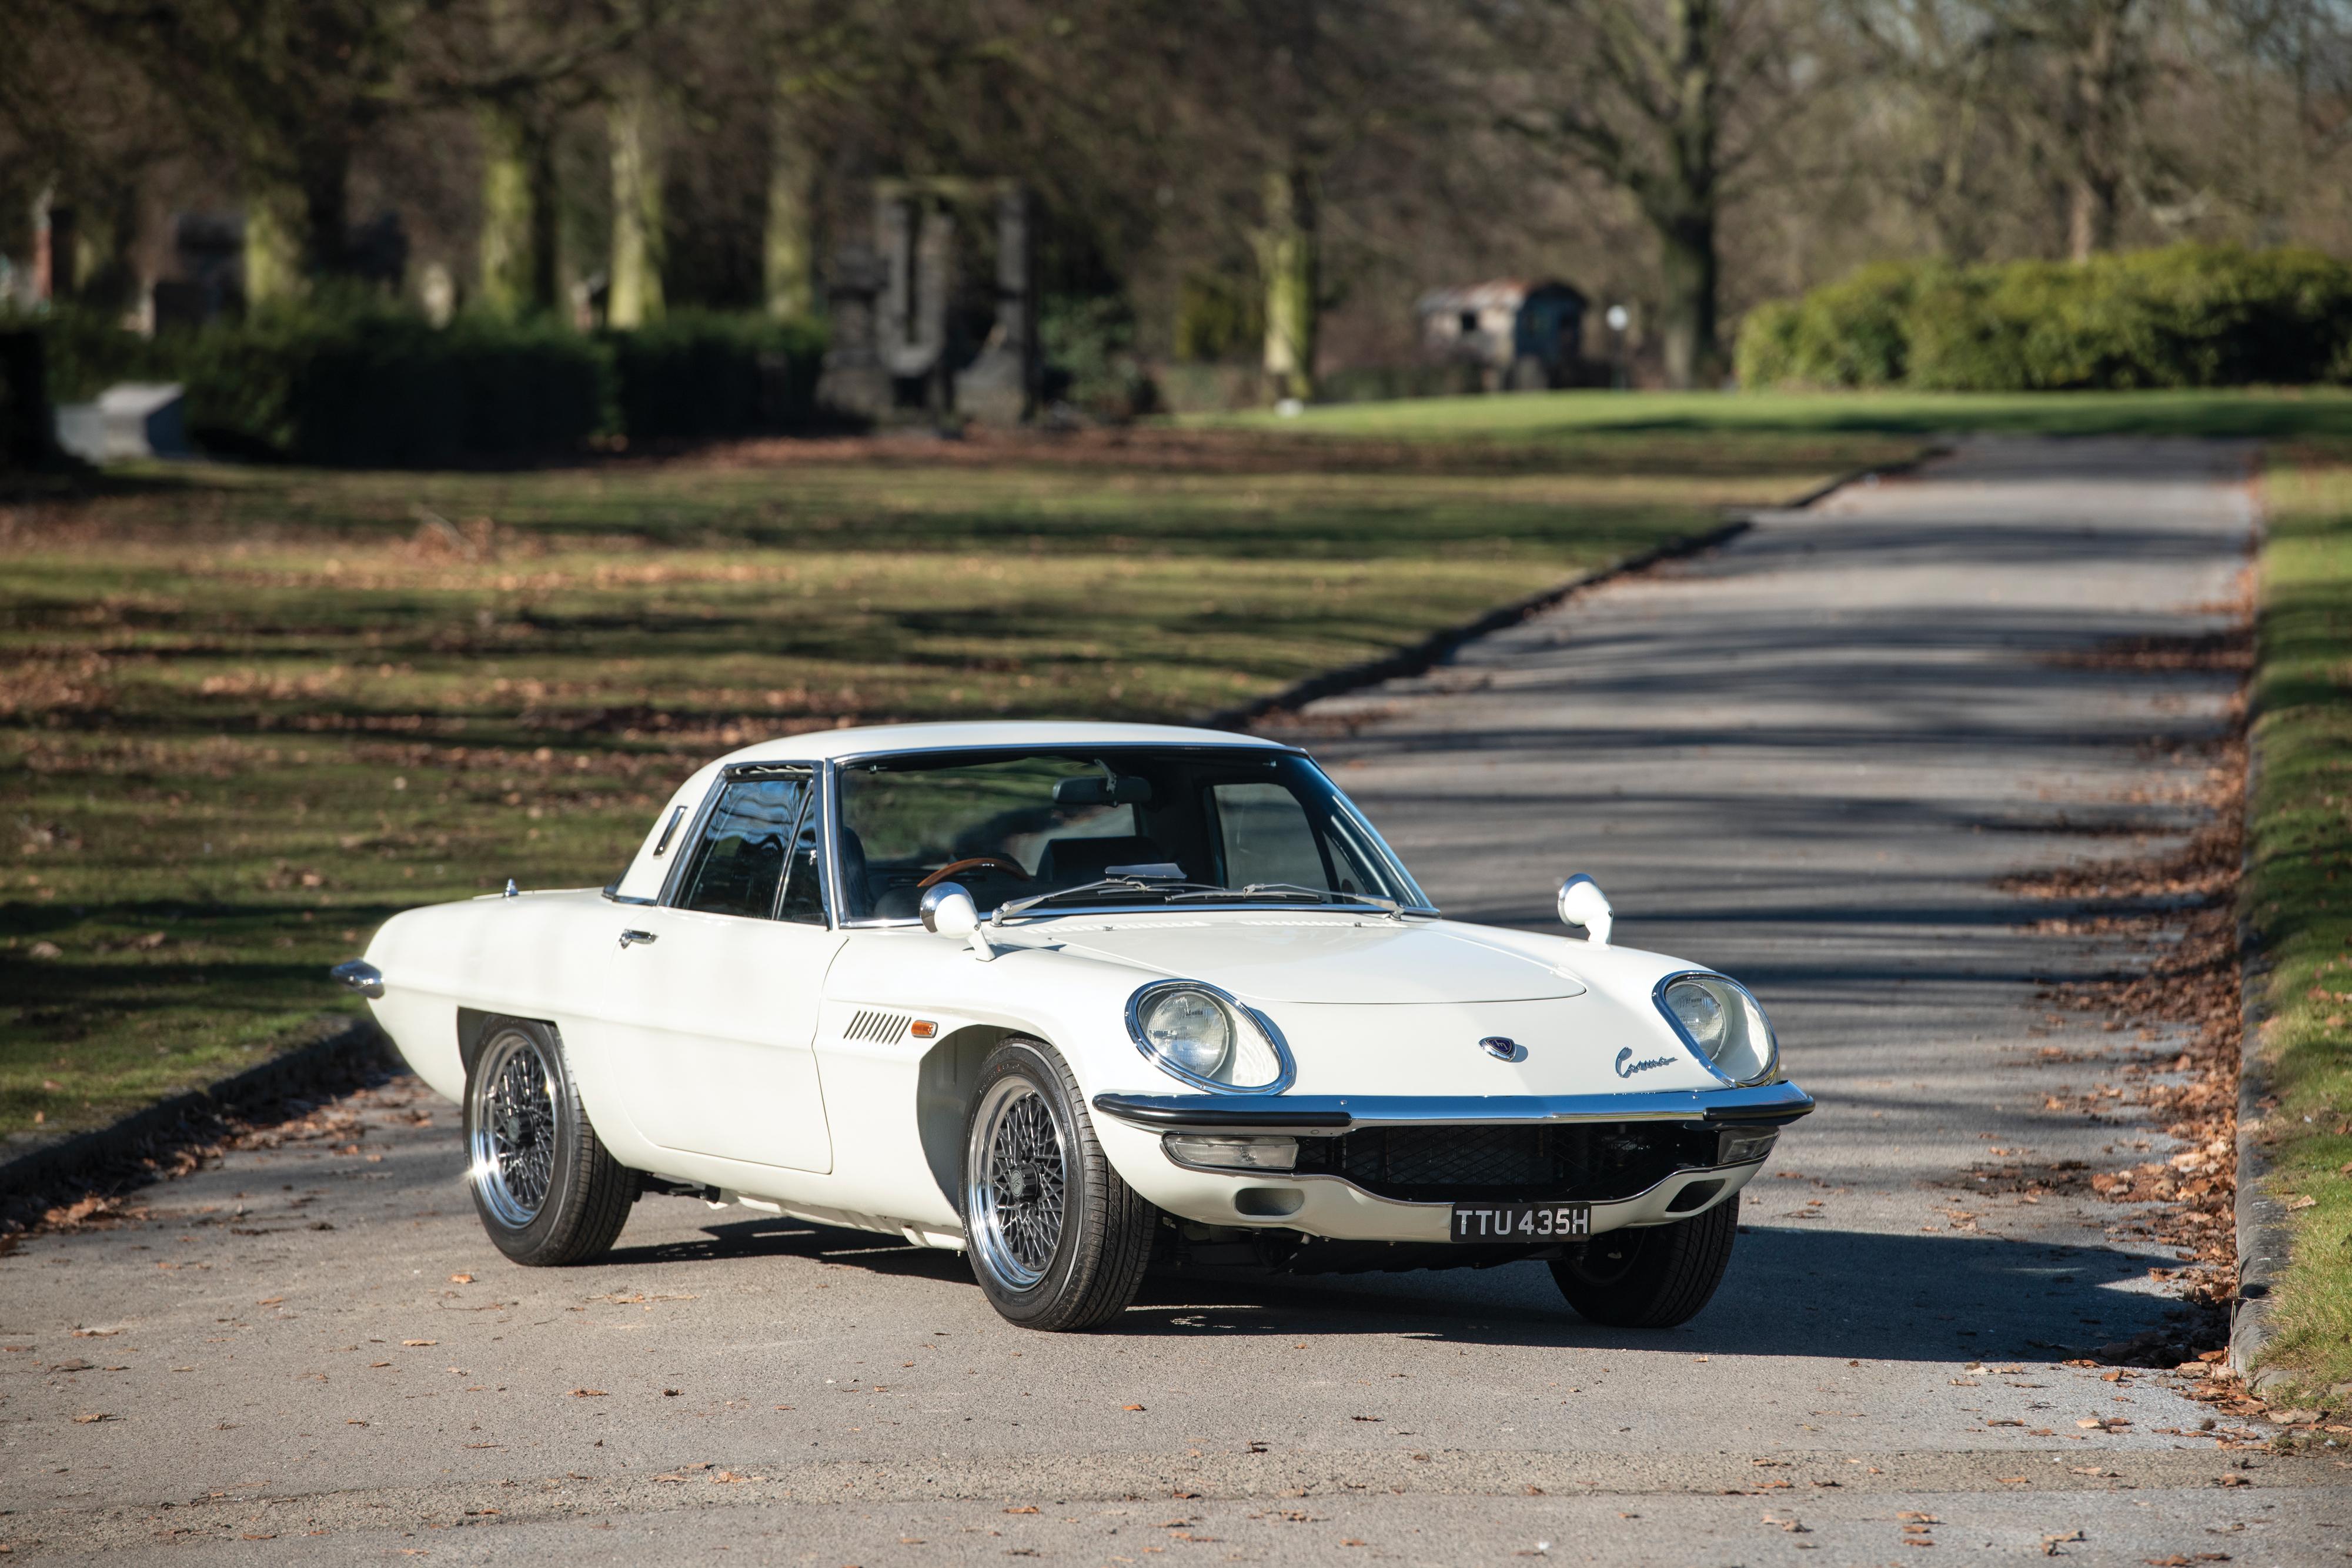 1970 Mazda Cosmo Sport - RM Sotheby's Essen Sale